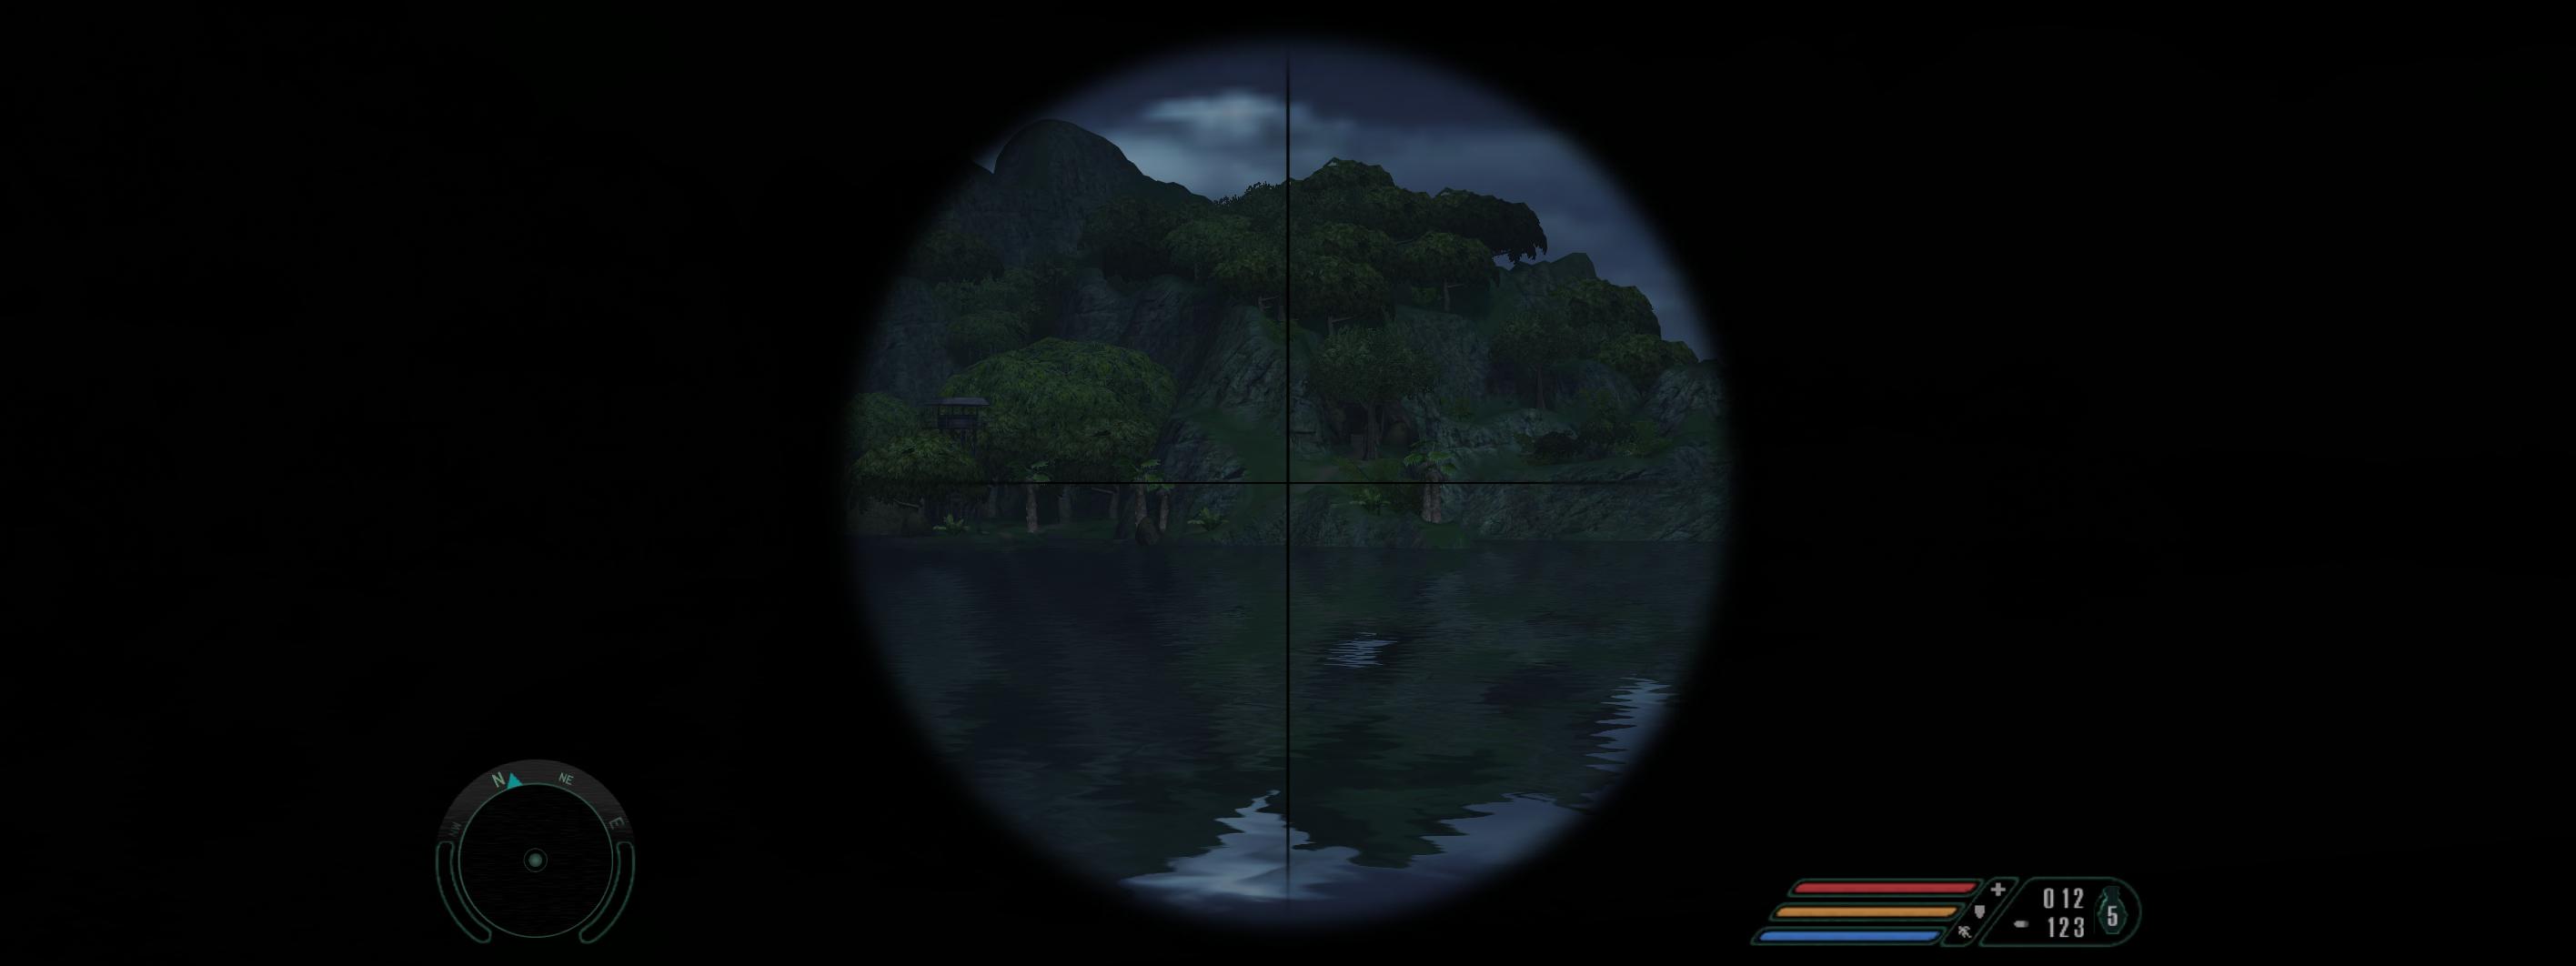 FarOut Widescreen mod for Far Cry - Mod DB